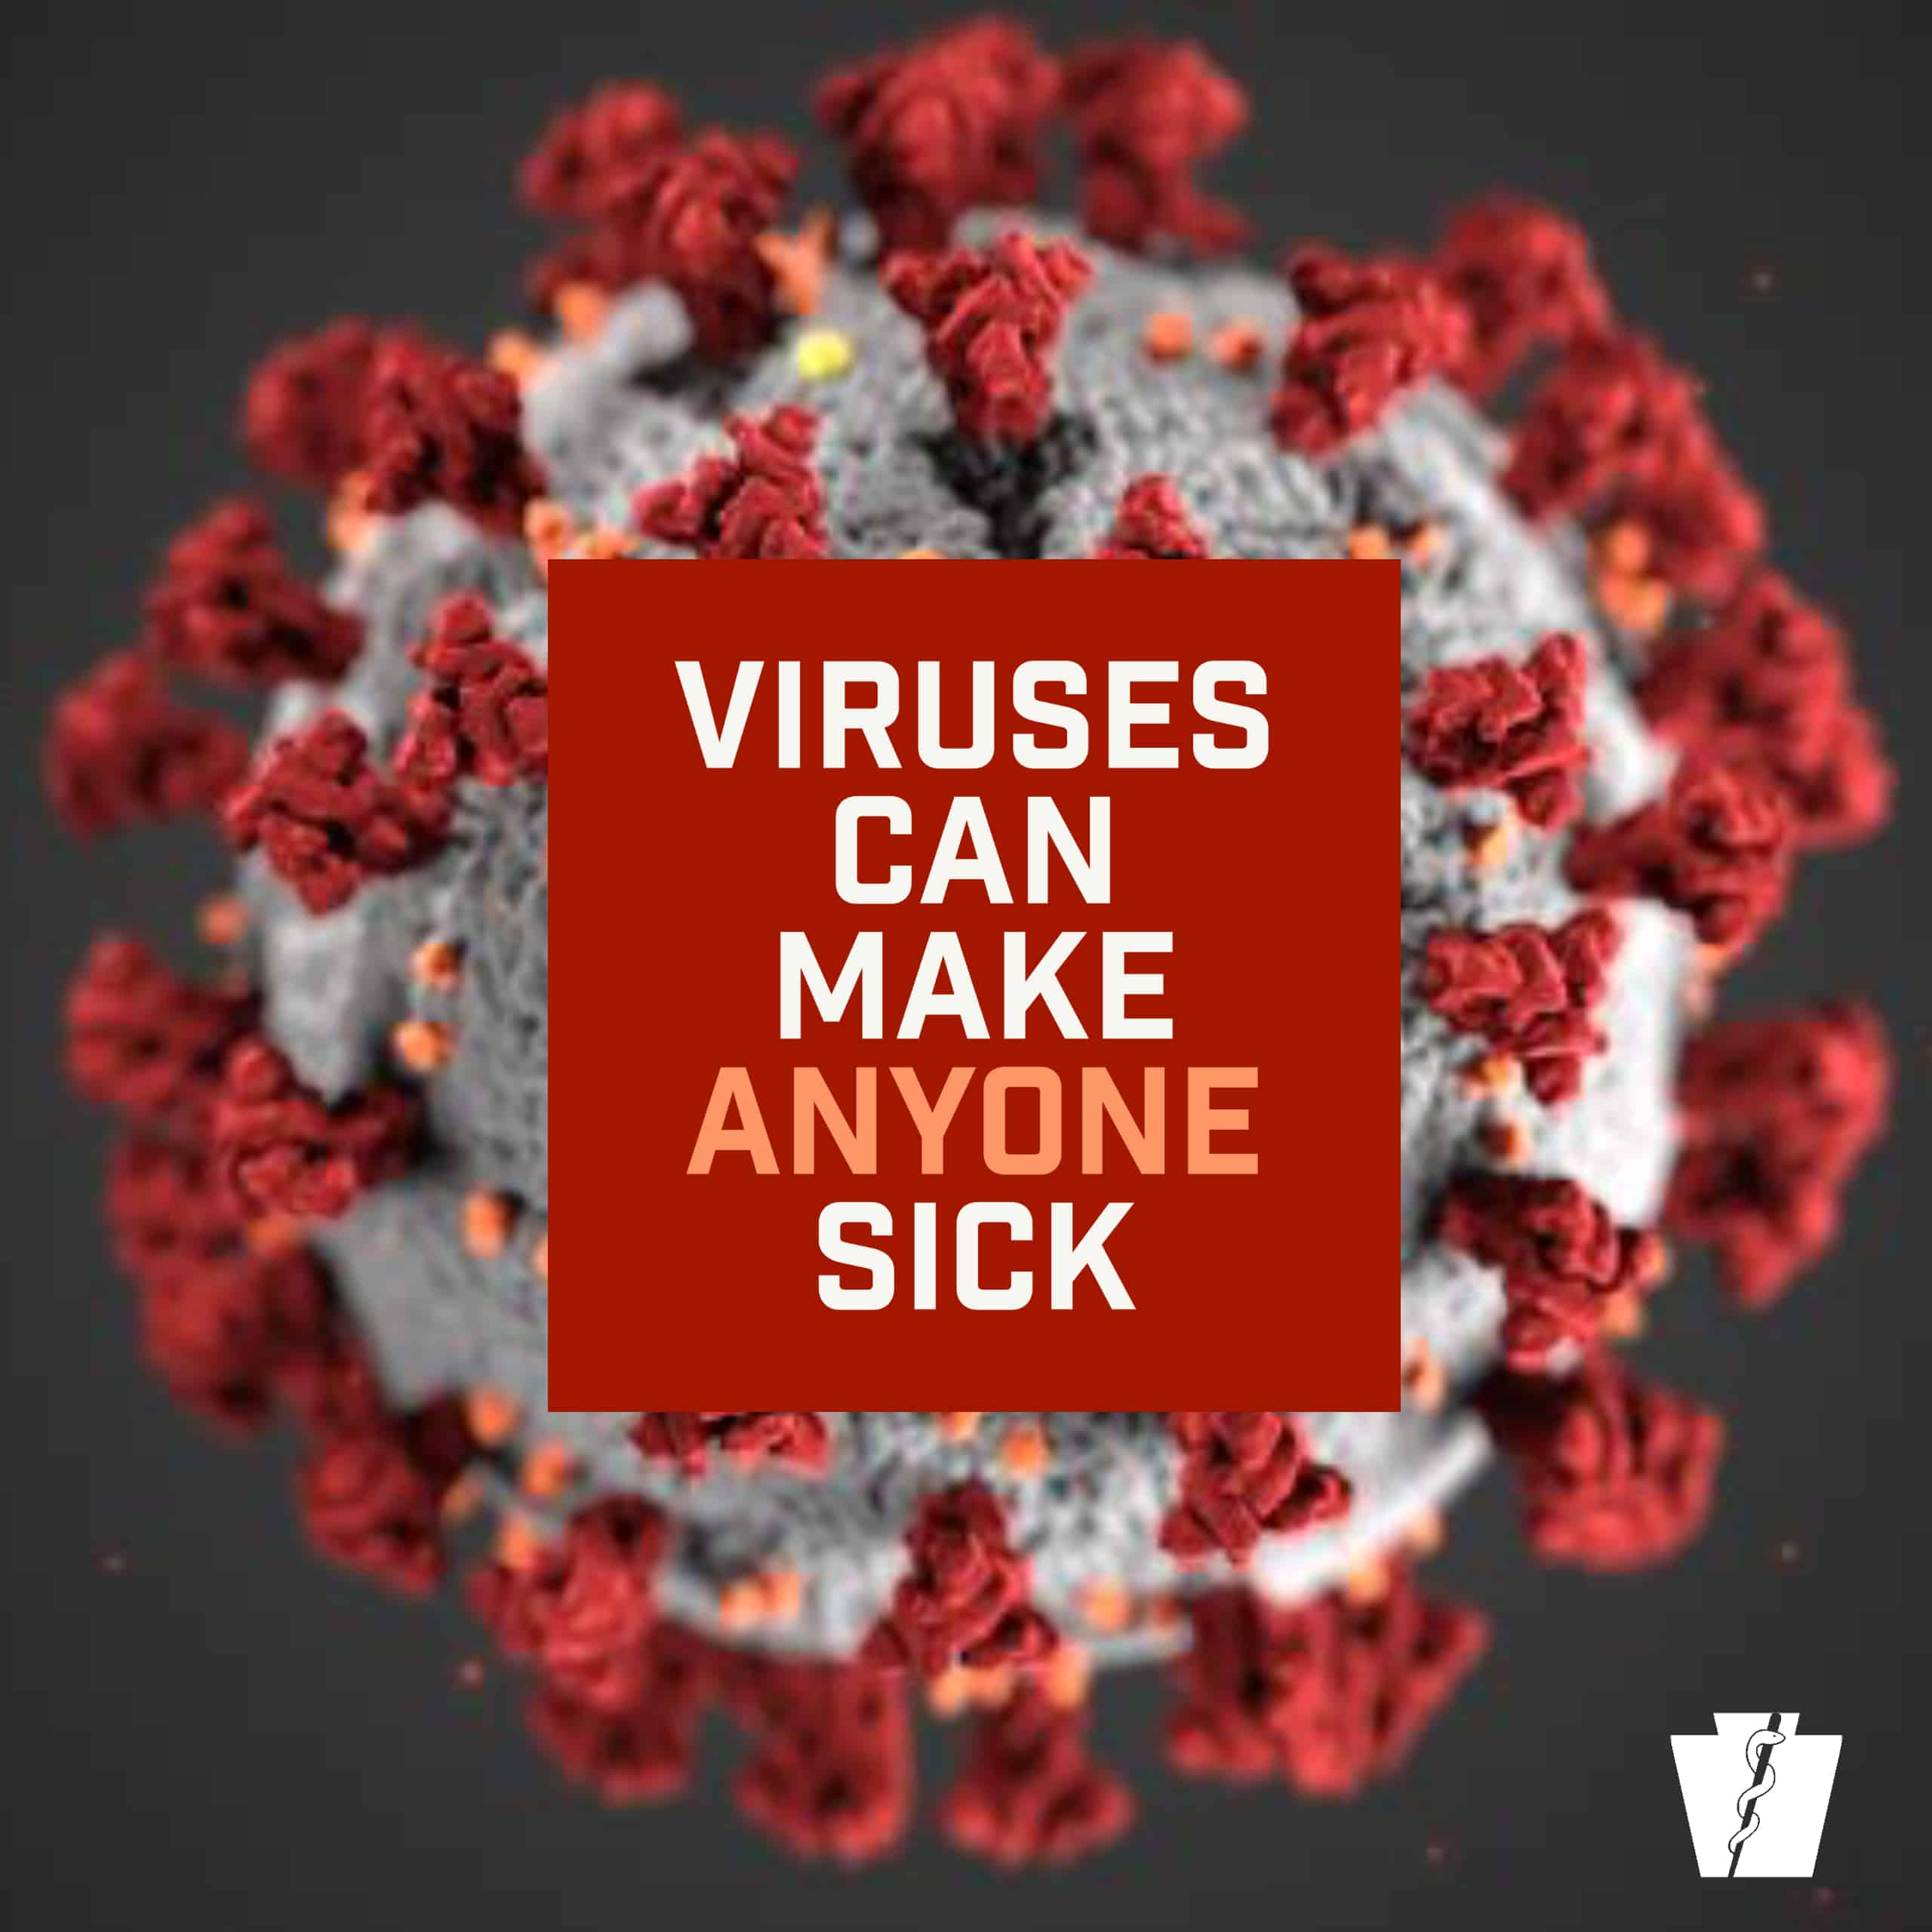 COVID-19 anyone can get a virus_Facebook